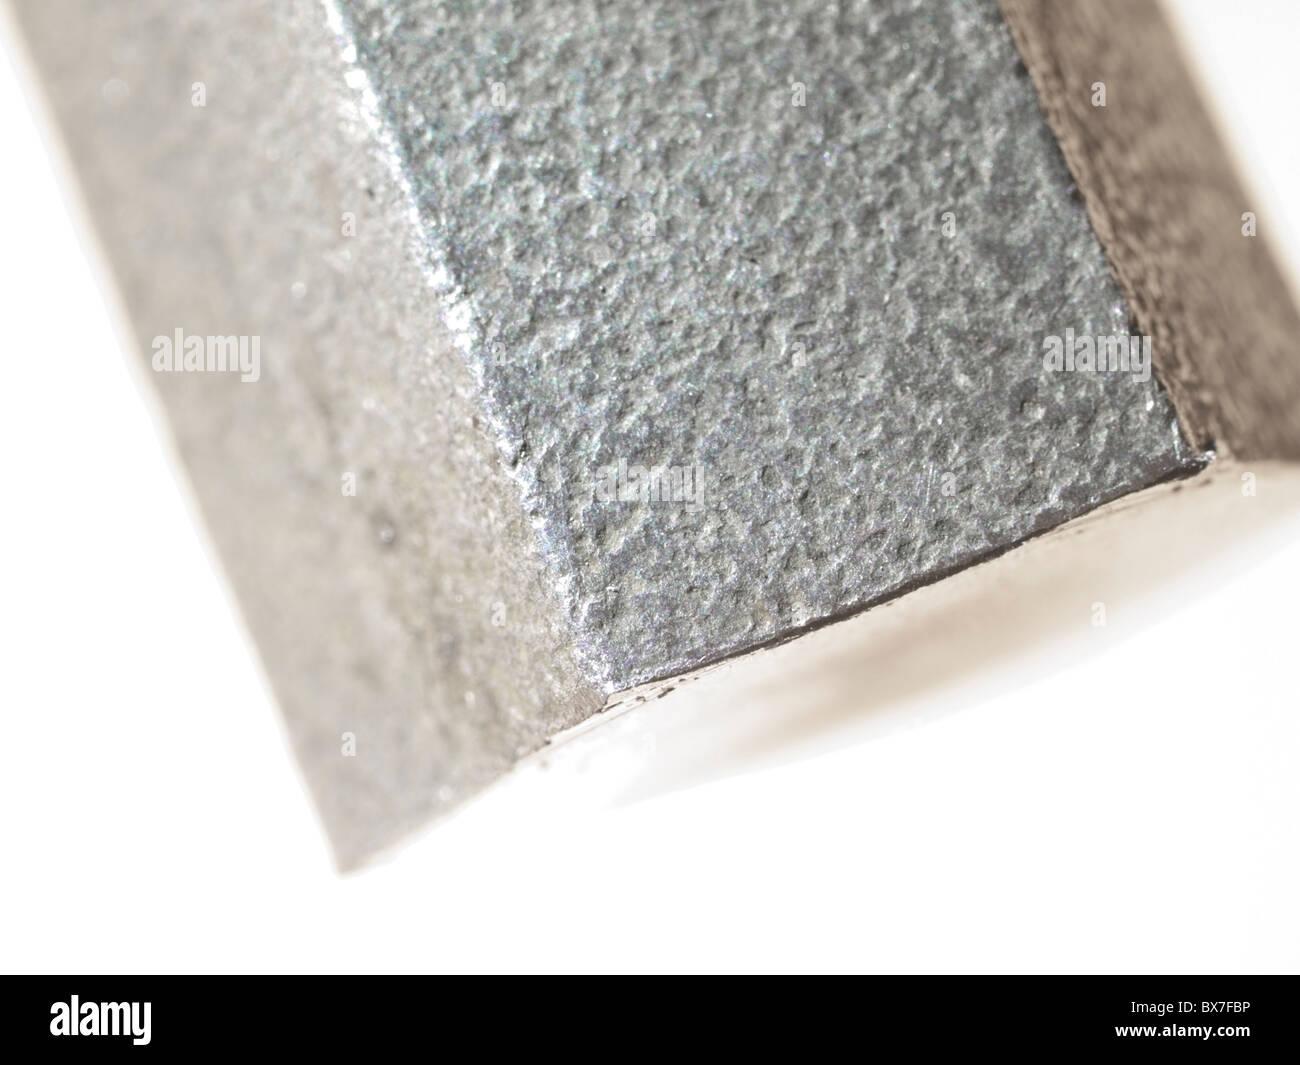 Superficie de acero inoxidable Imagen De Stock